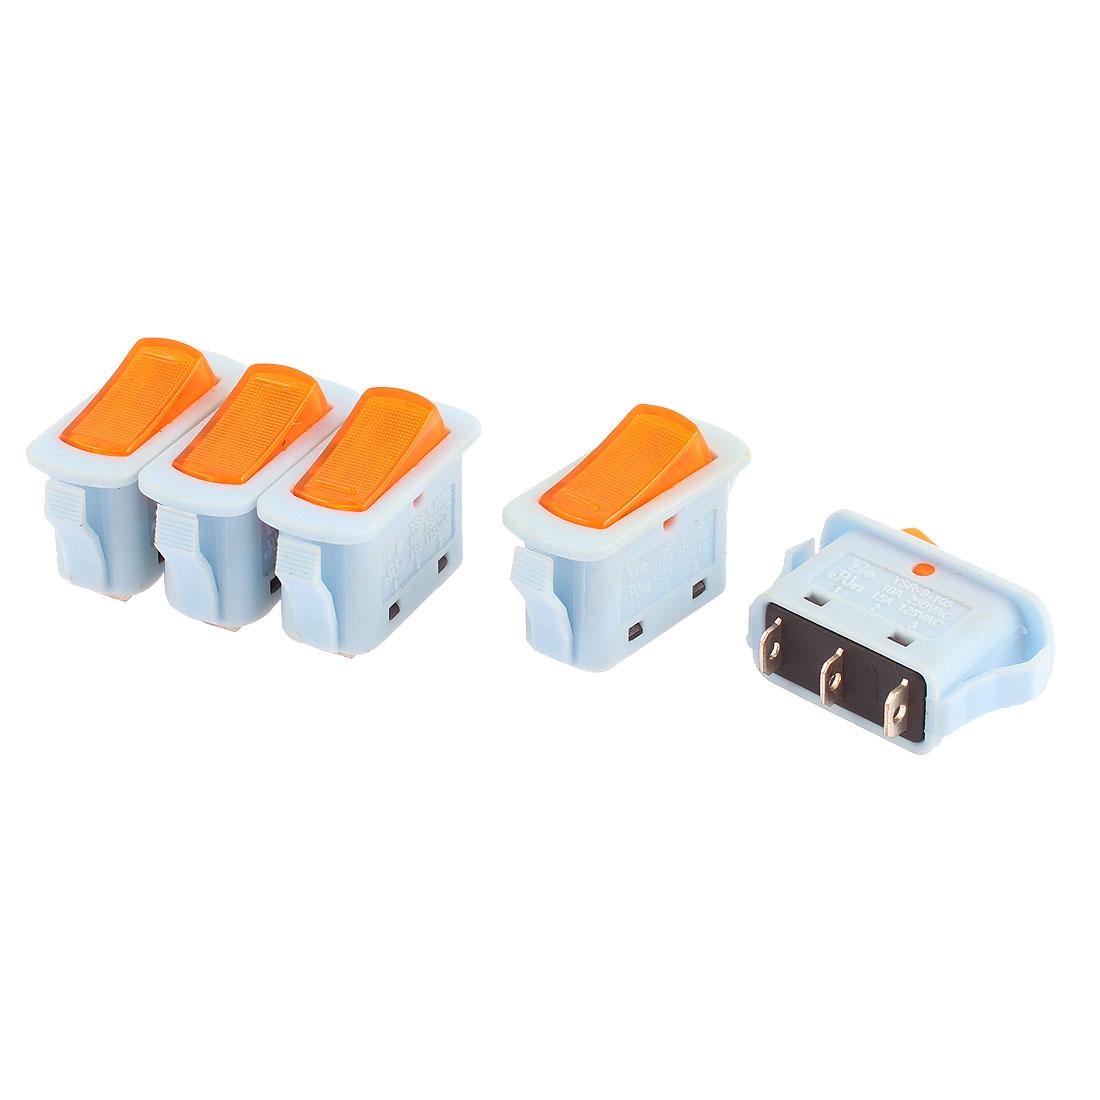 5Pcs AC 110V-220V Orange Light ON/OFF 2 Position Snap In SPST Boat Rocker Switch Blue